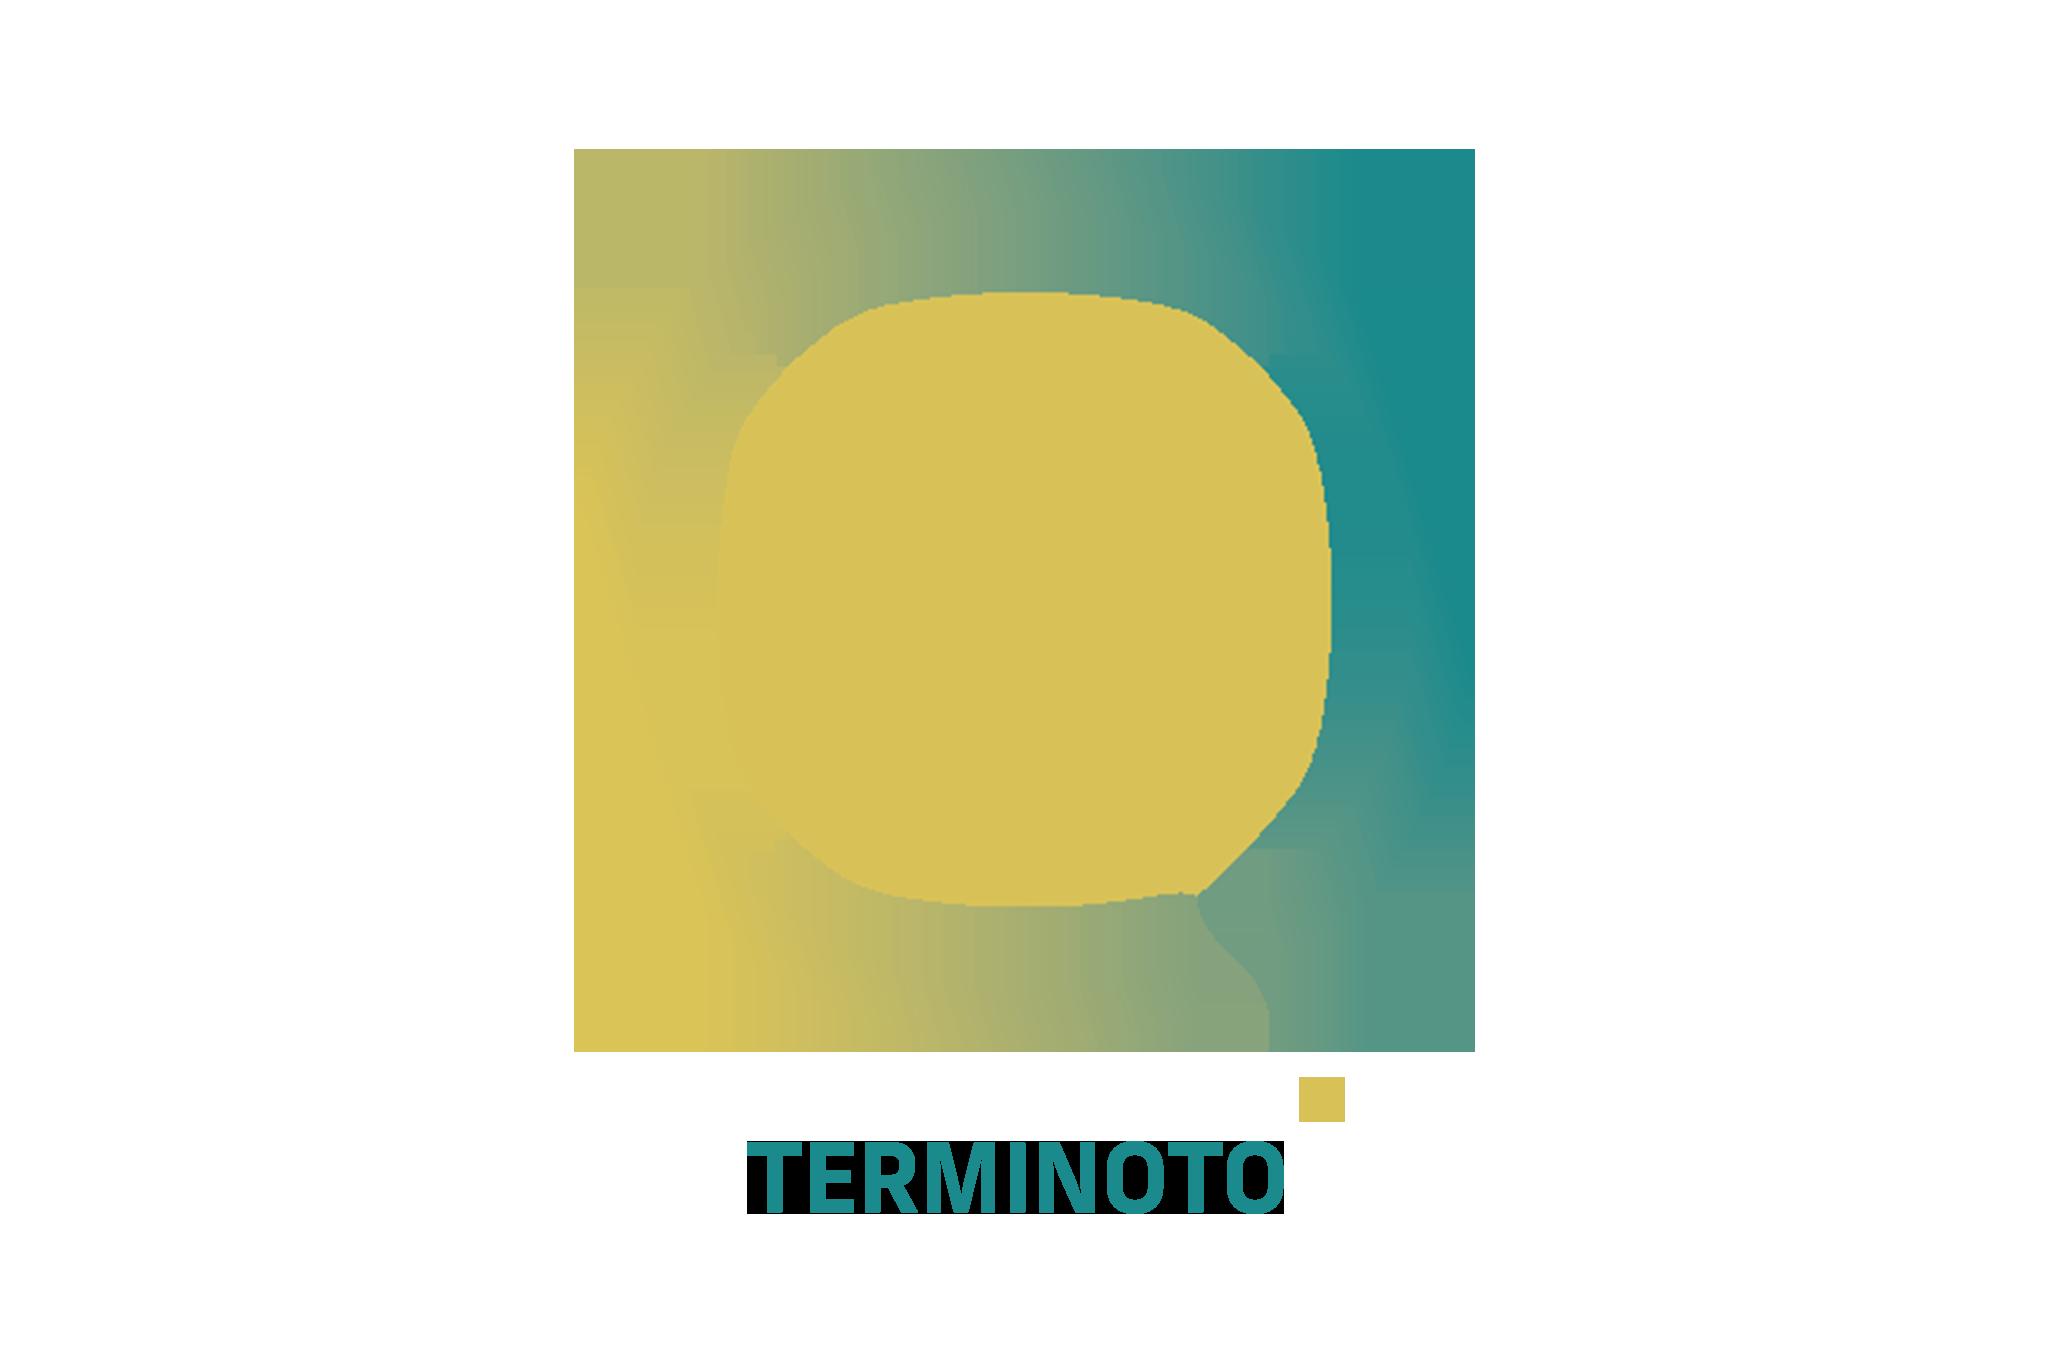 https://immotooler.com/wp-content/uploads/2017/11/TERMINOTO-ICON.png